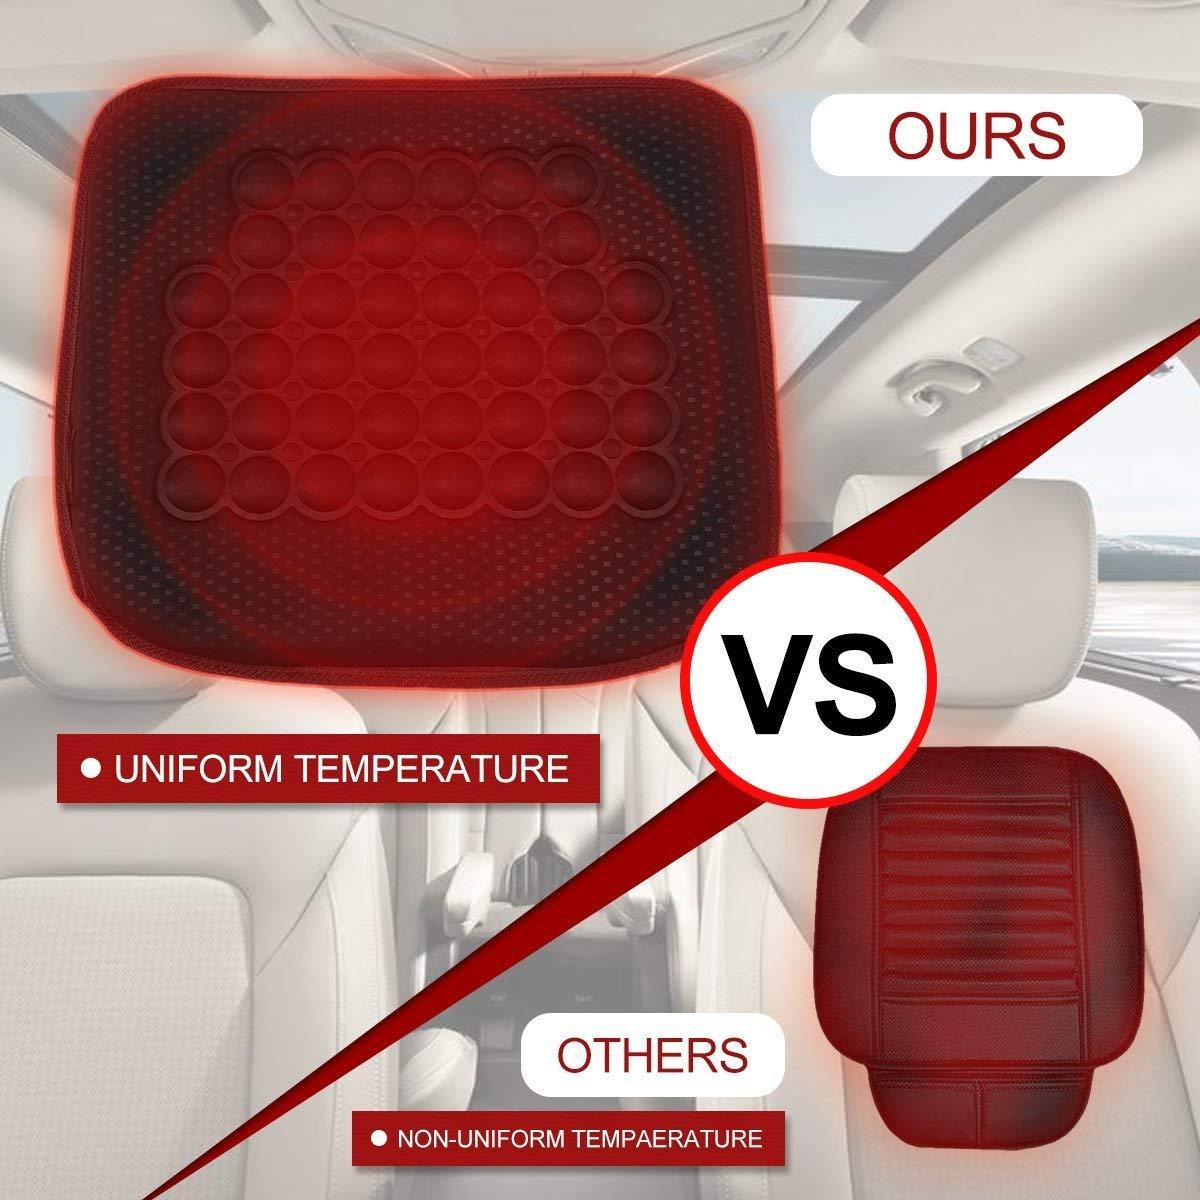 Tvird Heated seat Cushion,Seat Warmer,Car seat Cushion,Auto seat Cushions 12V Ultra Comfortable Heating Car Seat Cushion Black,Adjustable Temperature